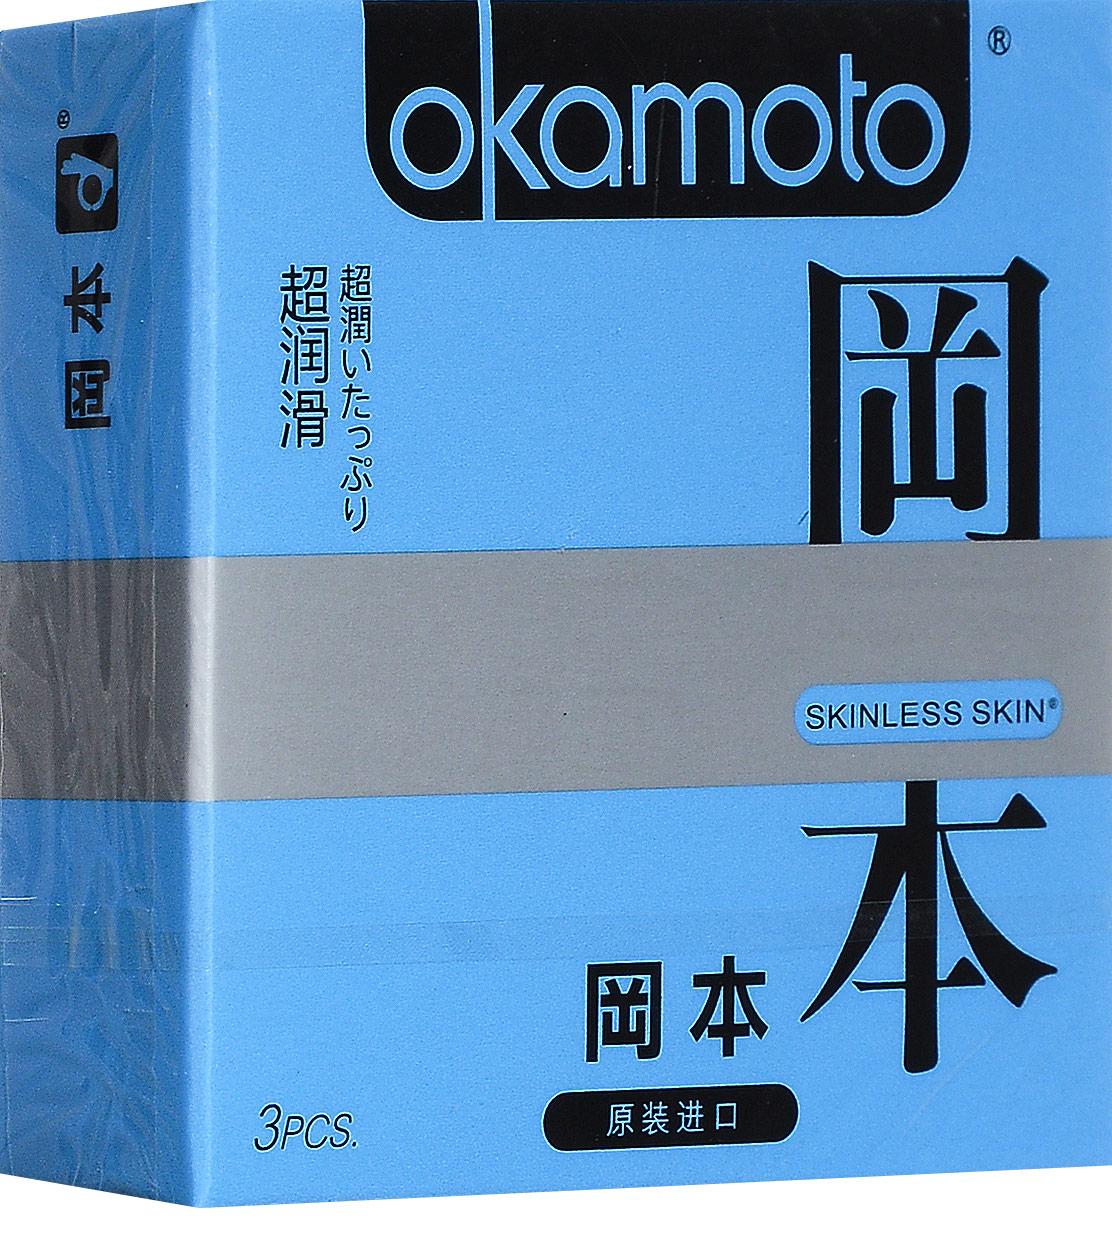 Презервативы Okamоto Skinless Skin Super Lubricative 3 шт c обильной смазкой68969/1Презервативы Okamоto Skinless Skin Super Lubricative 3 шт c обильной смазкой